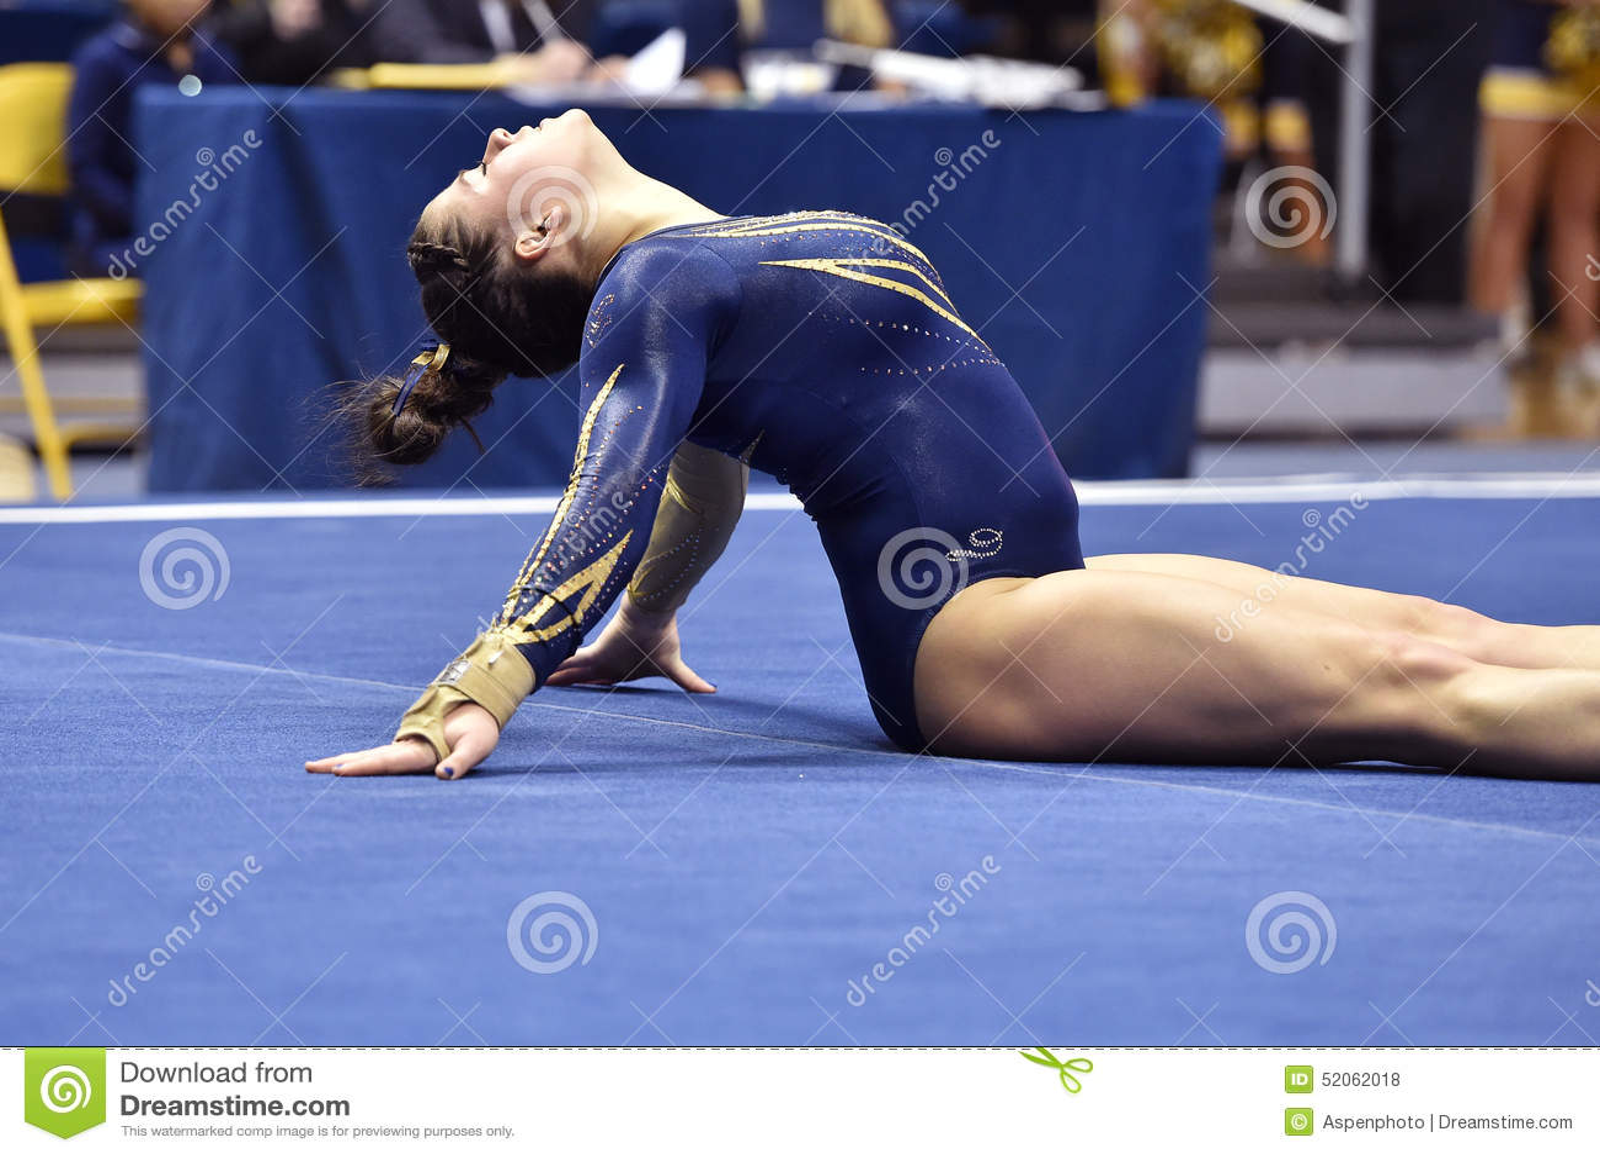 wcgc gymnastics state meet